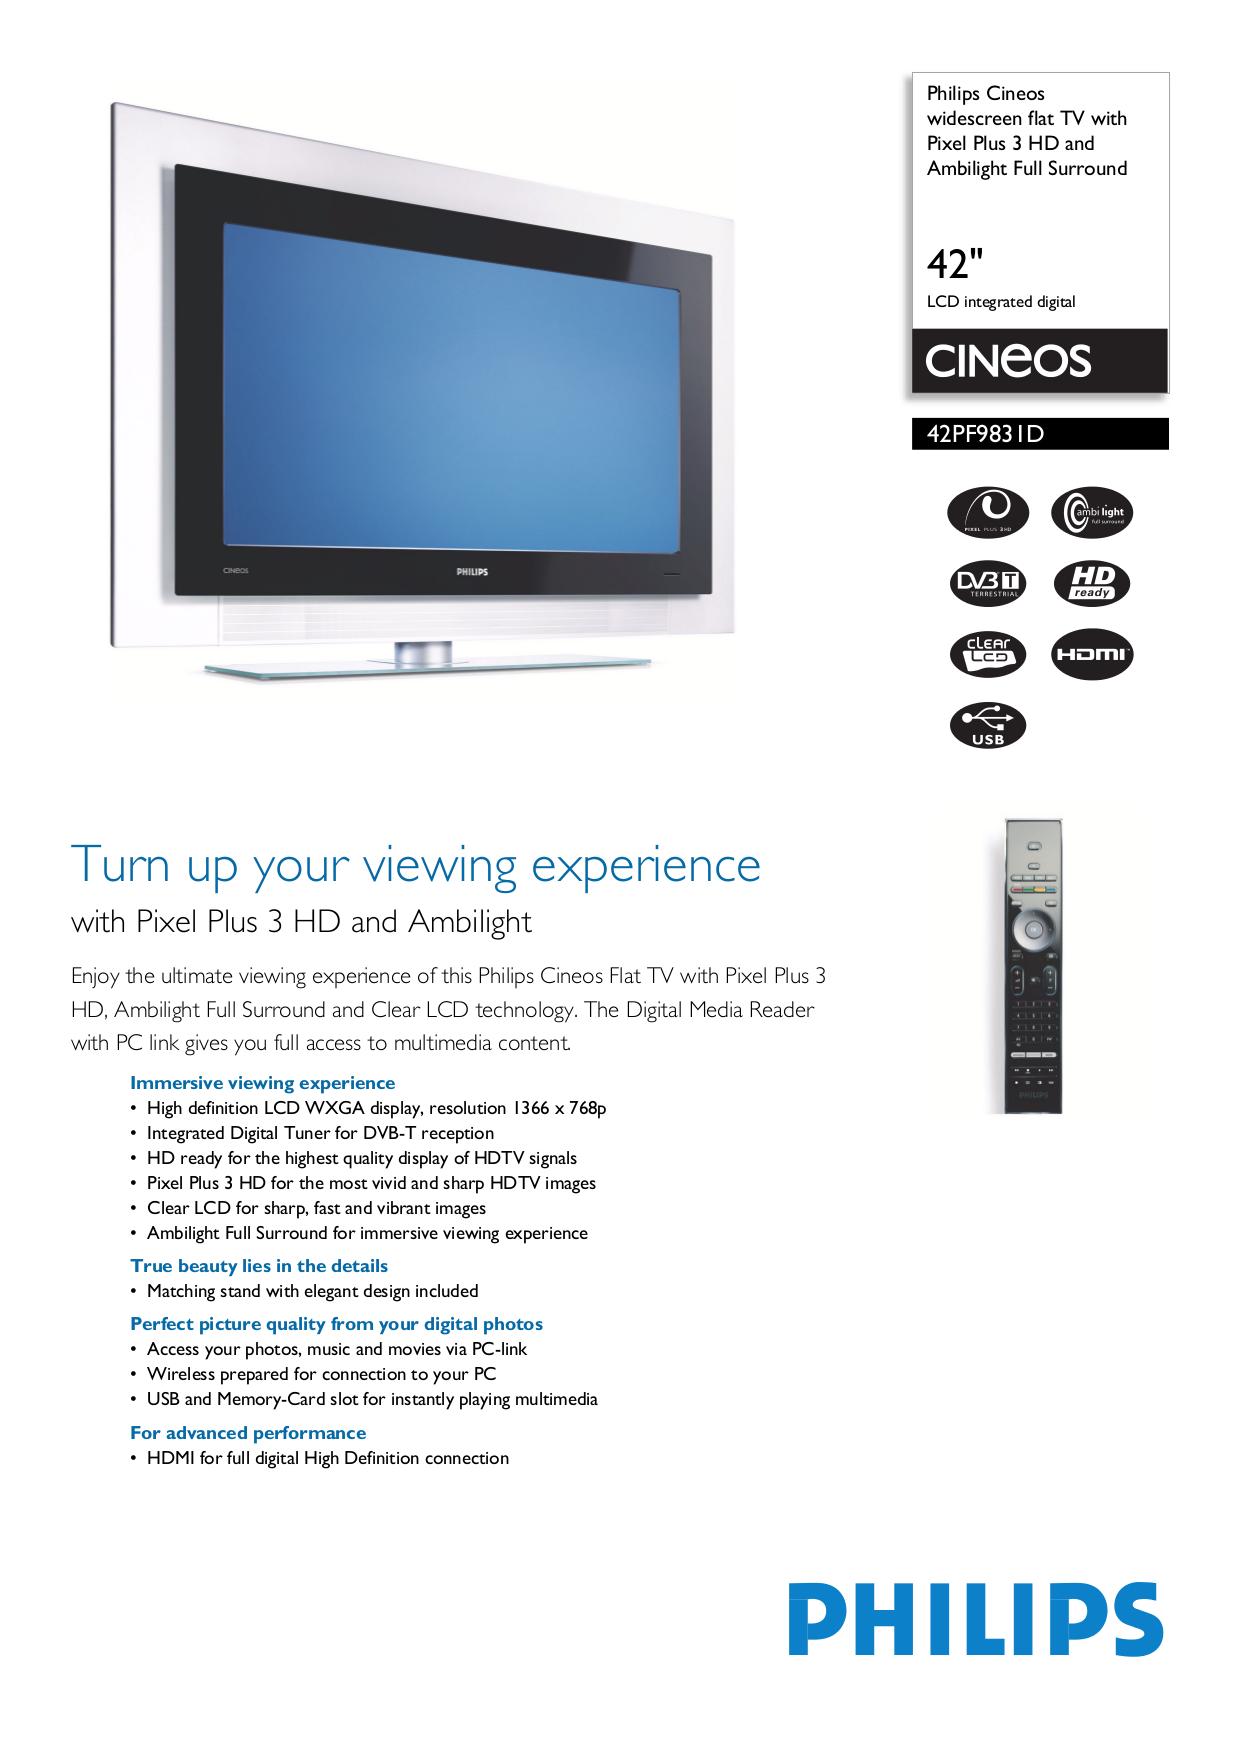 philips 42 lcd tv manual daily instruction manual guides u2022 rh testingwordpress co Philips Flat Screen TV Philips Flat Screen TV